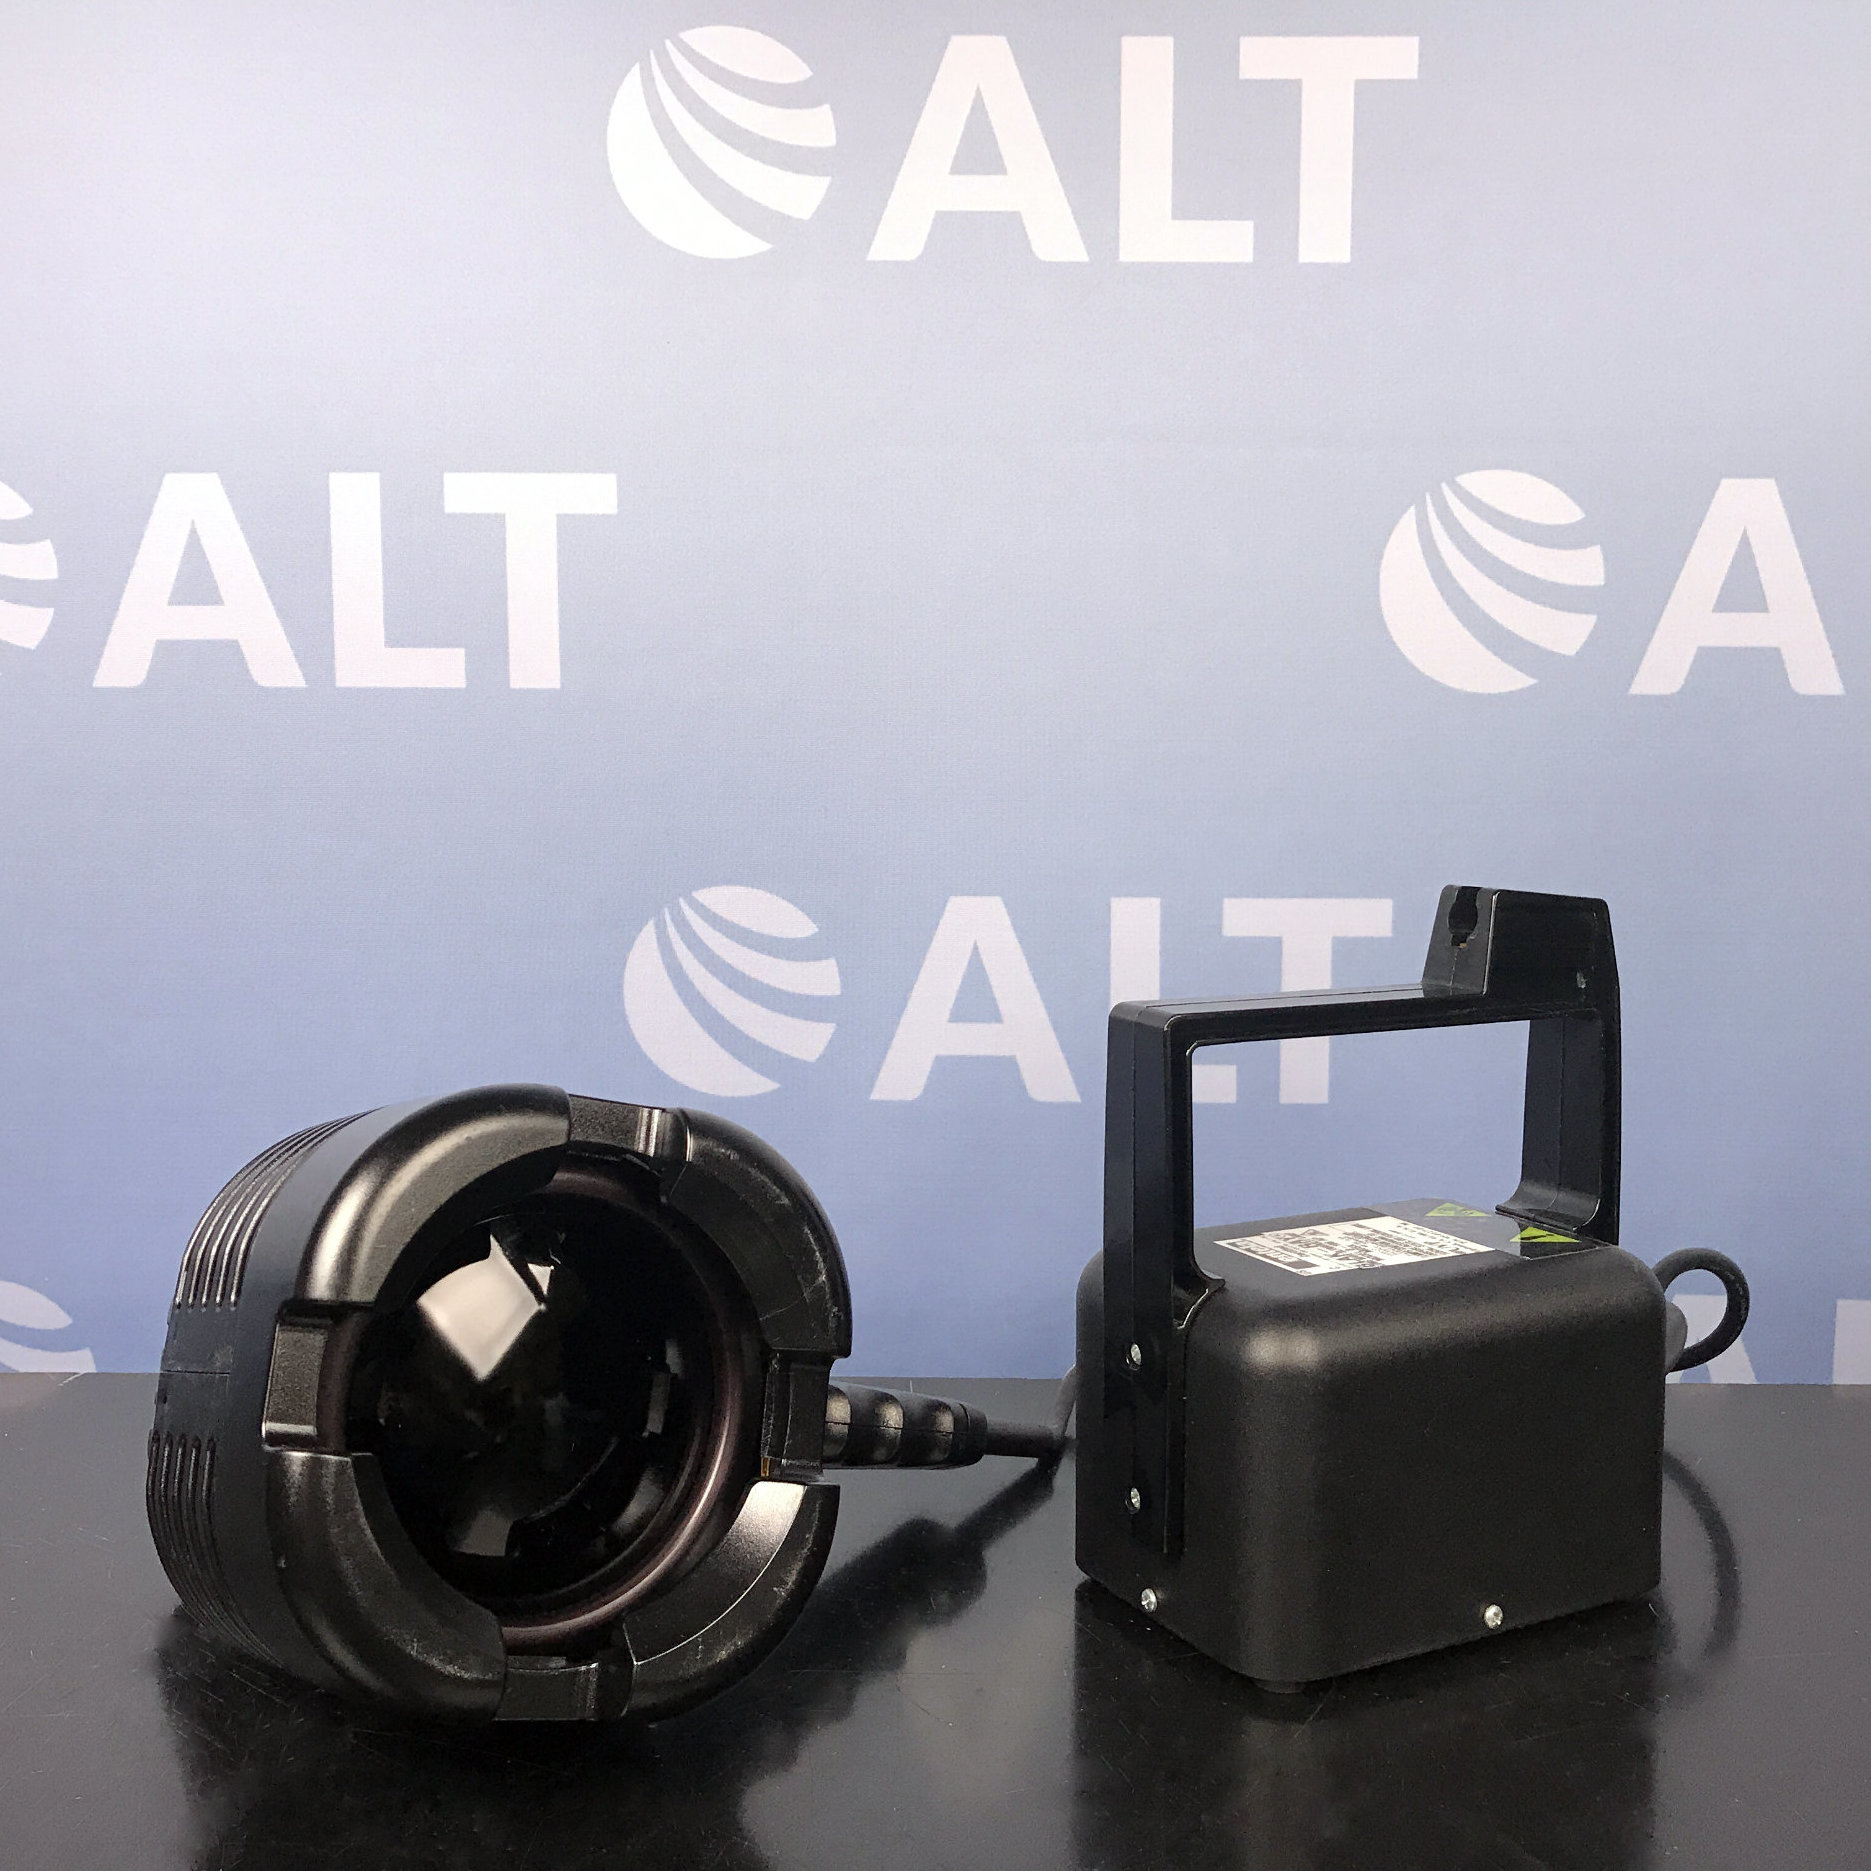 Entela Blak-Ray B-100AP/R High-Intensity UV Inspection Lamp Image